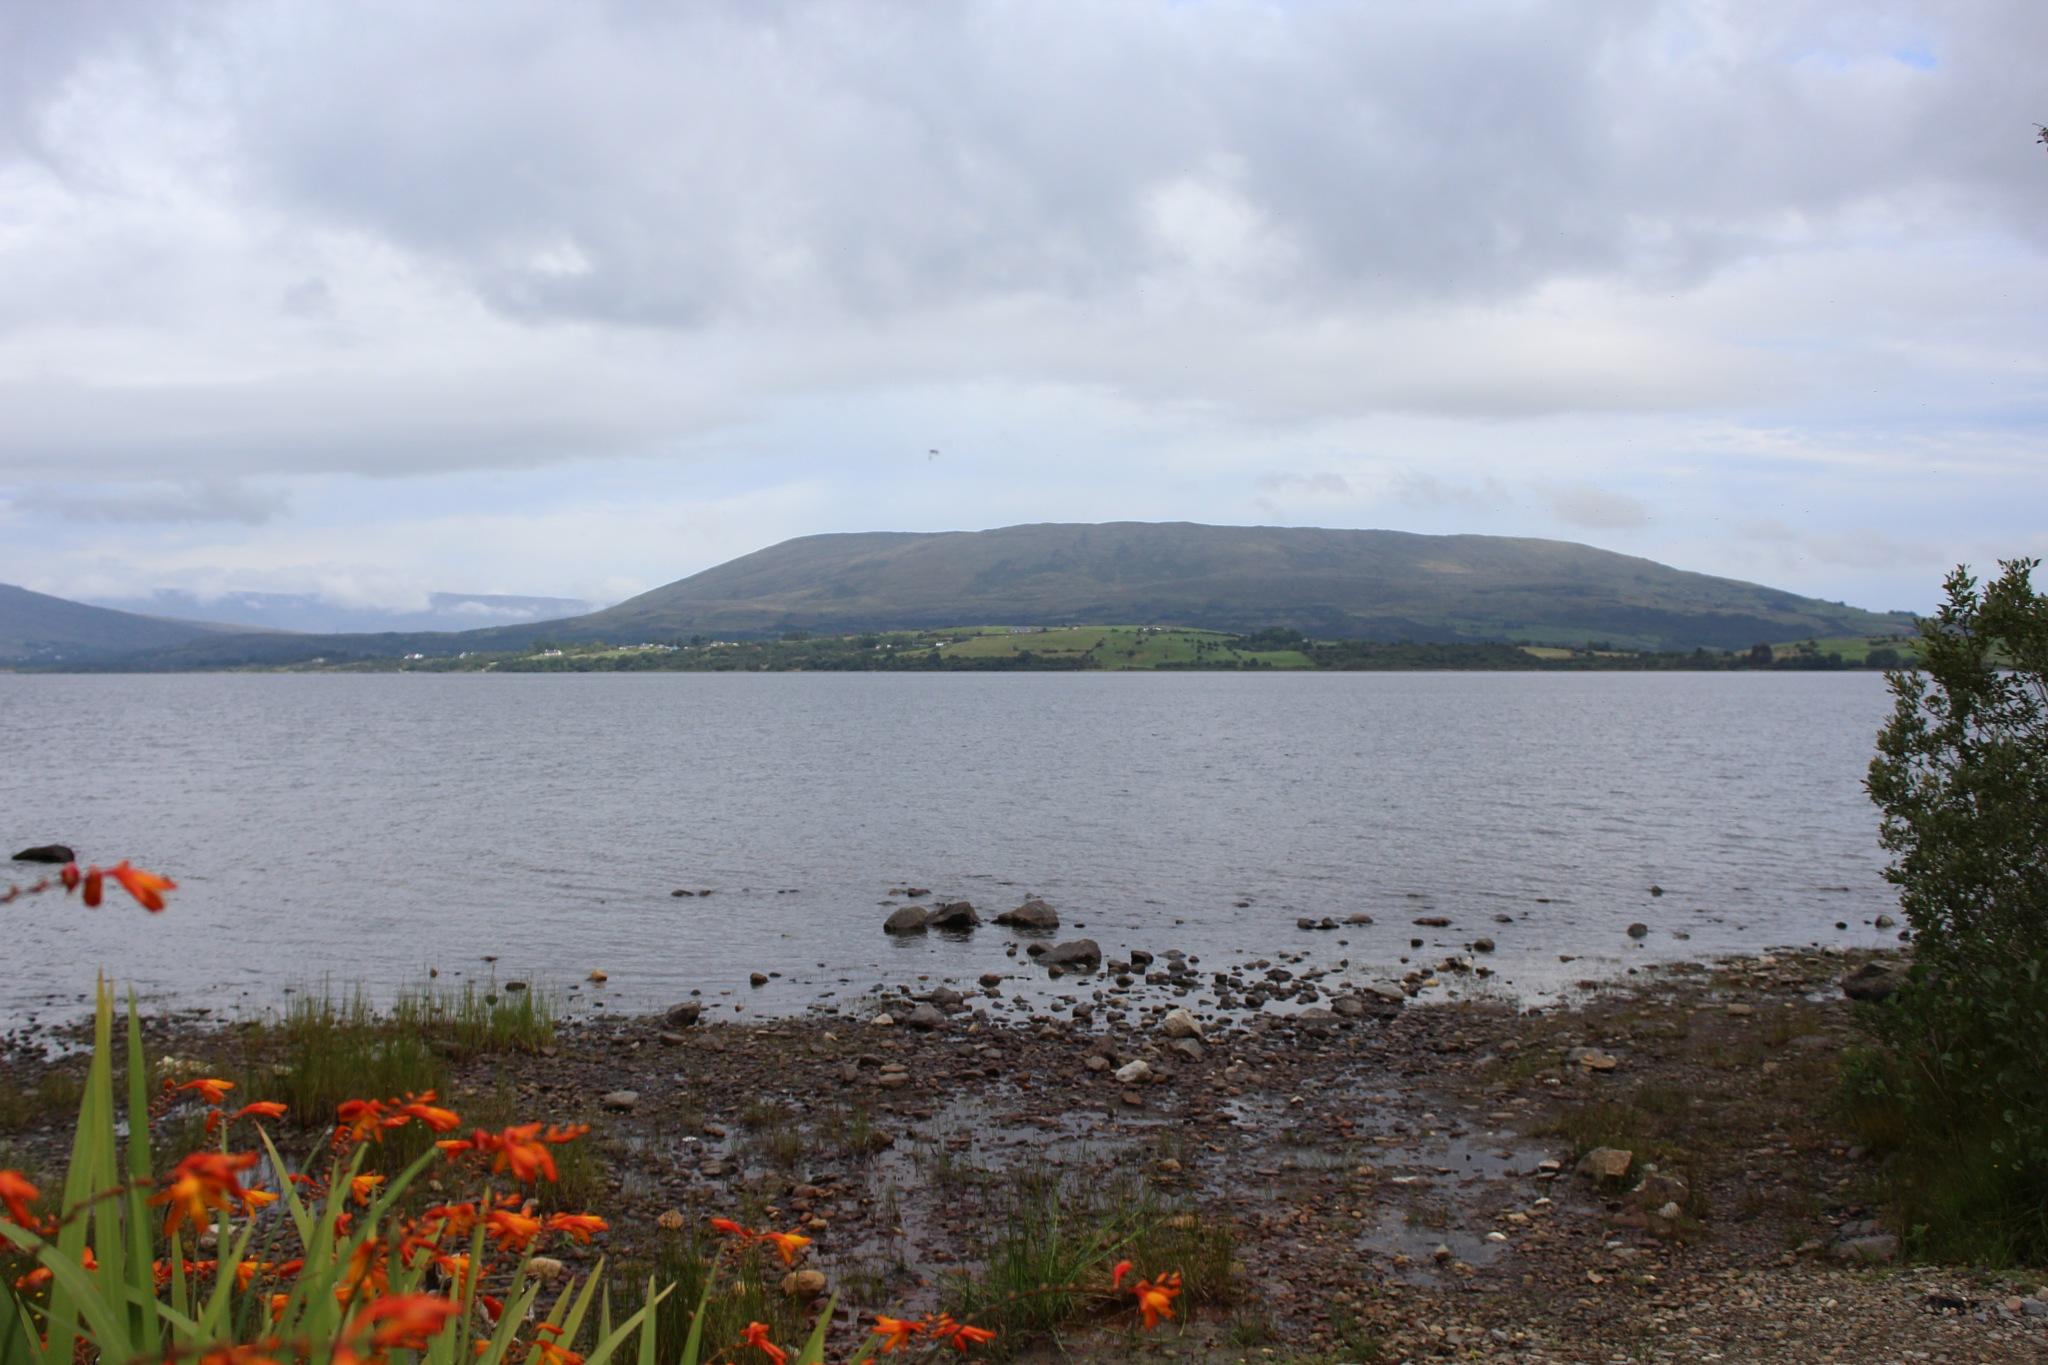 Lough Corrib, Oughterard, Co Galway, Ireland by Gunnerman85